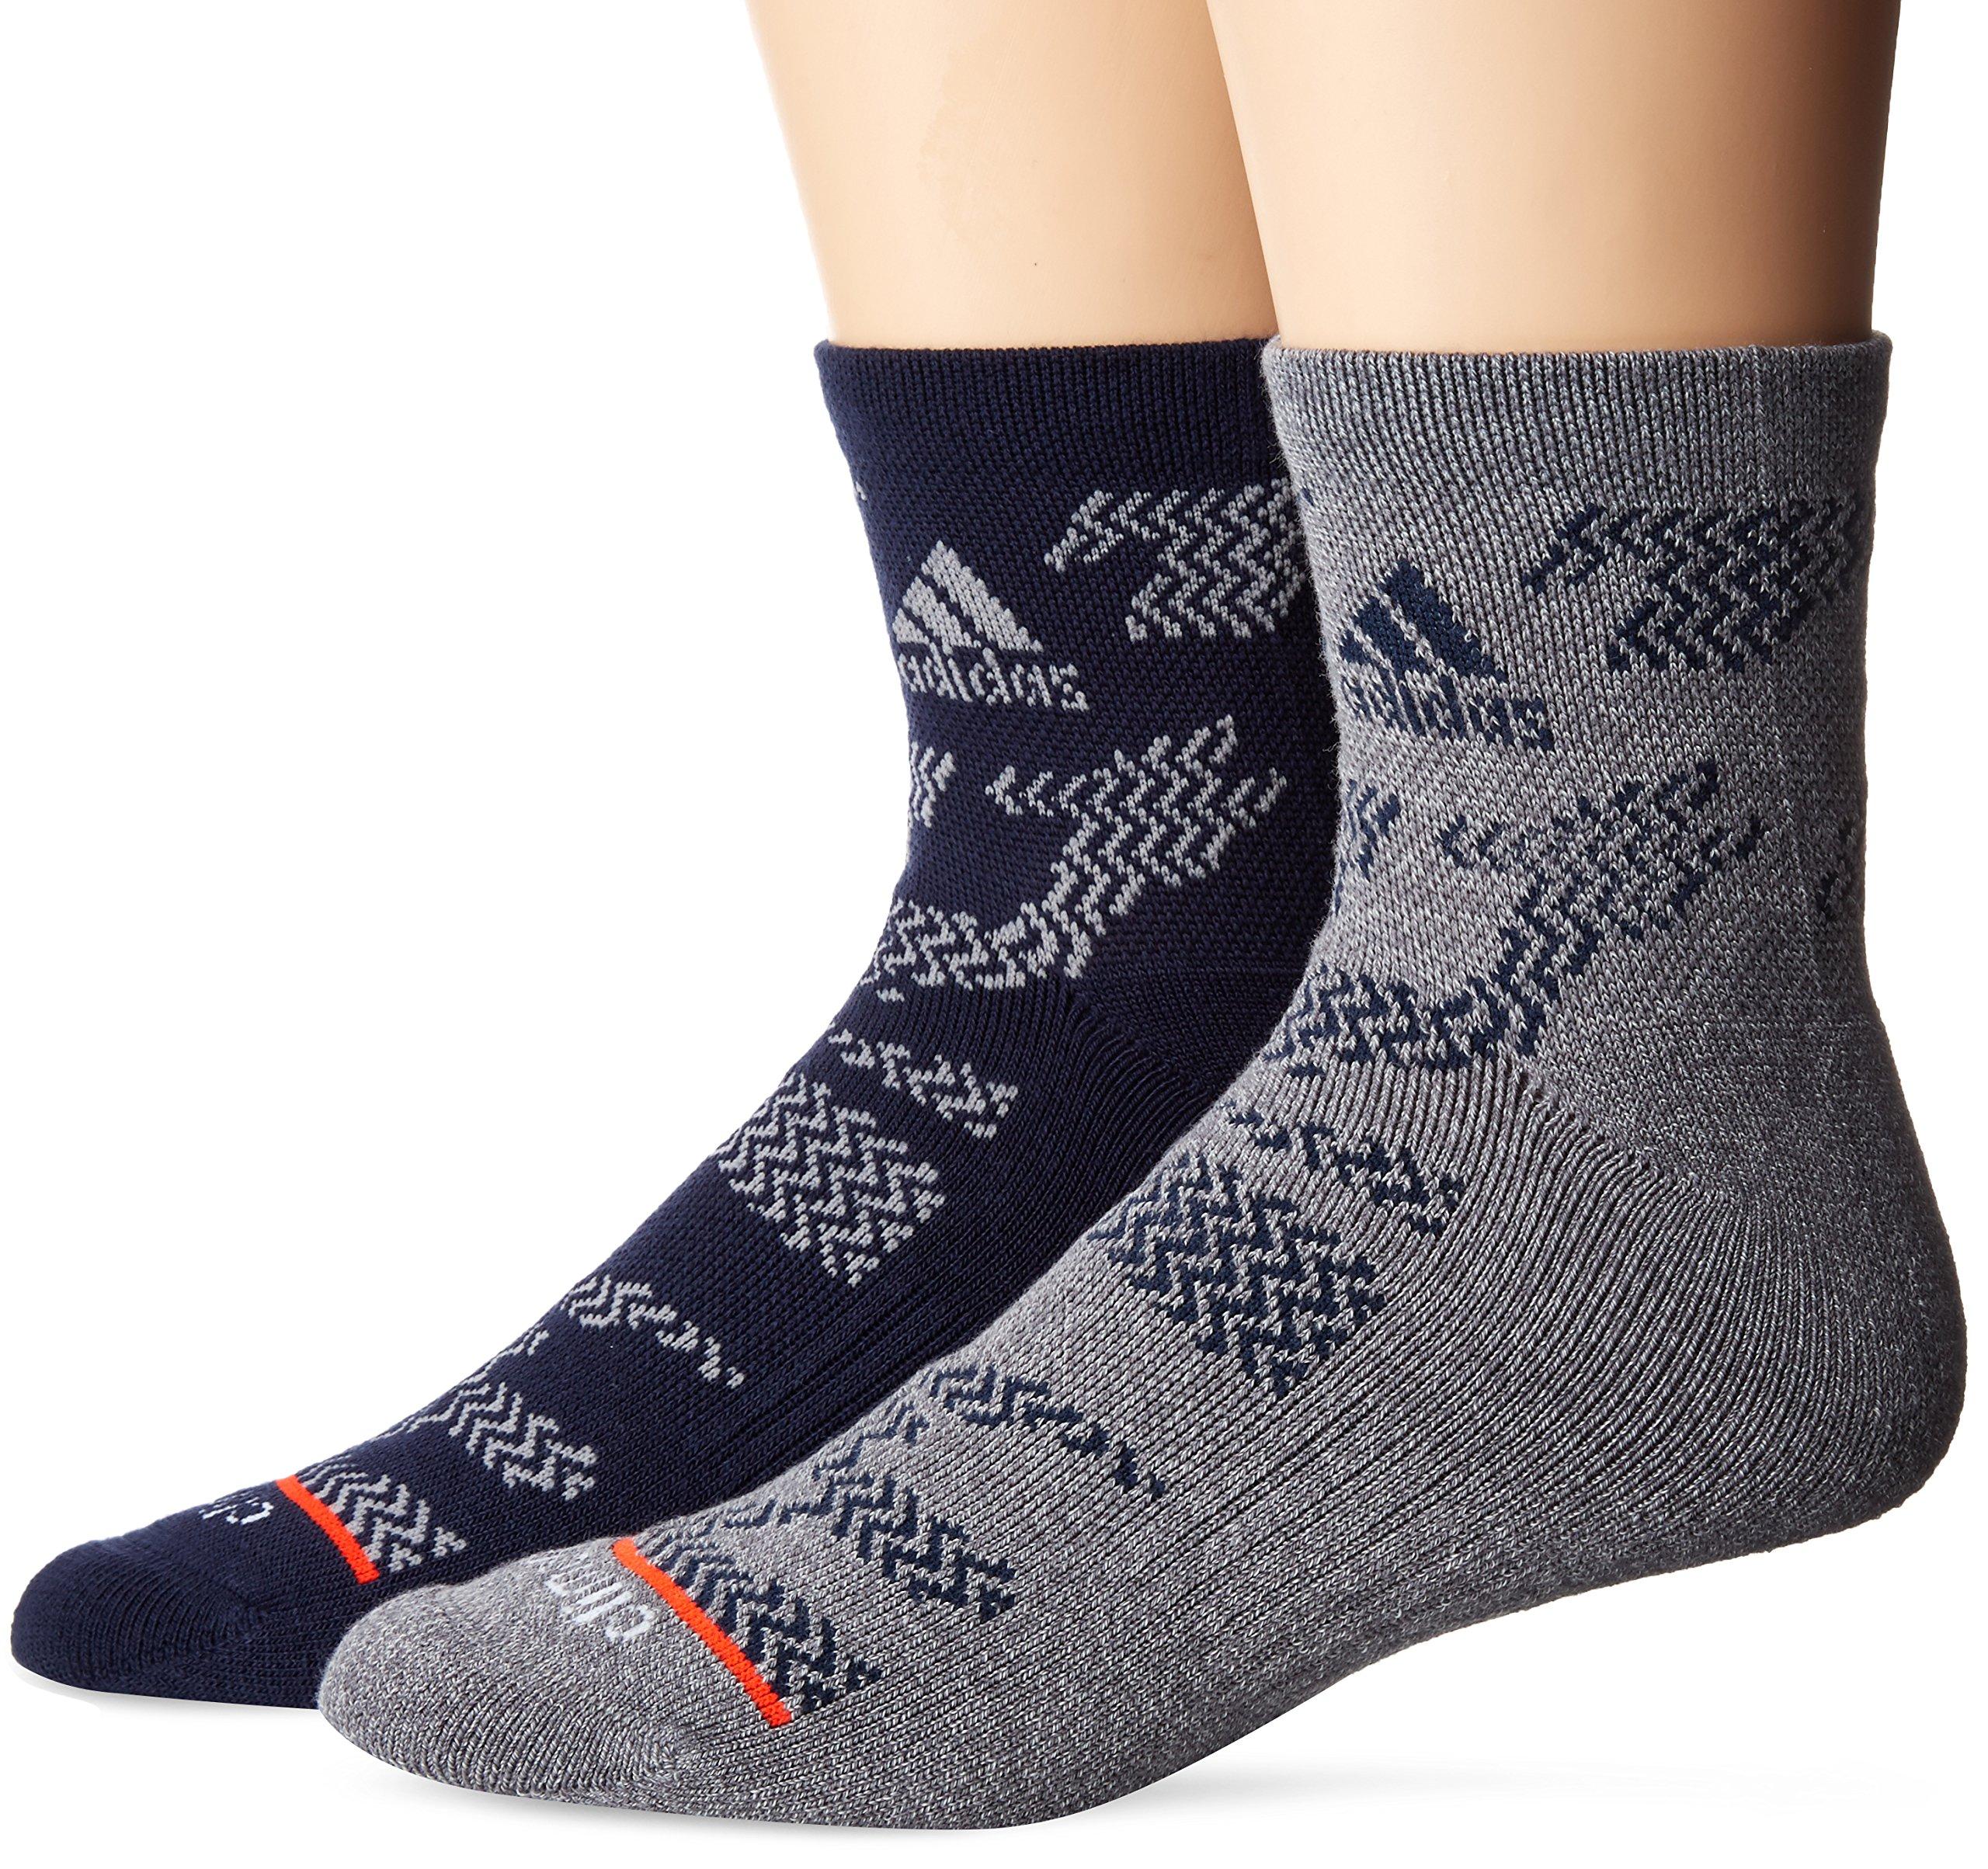 resist best socks comforter blister show balega athletic no in comfort for pair women pcr helpful men customer hidden s and rated reviews